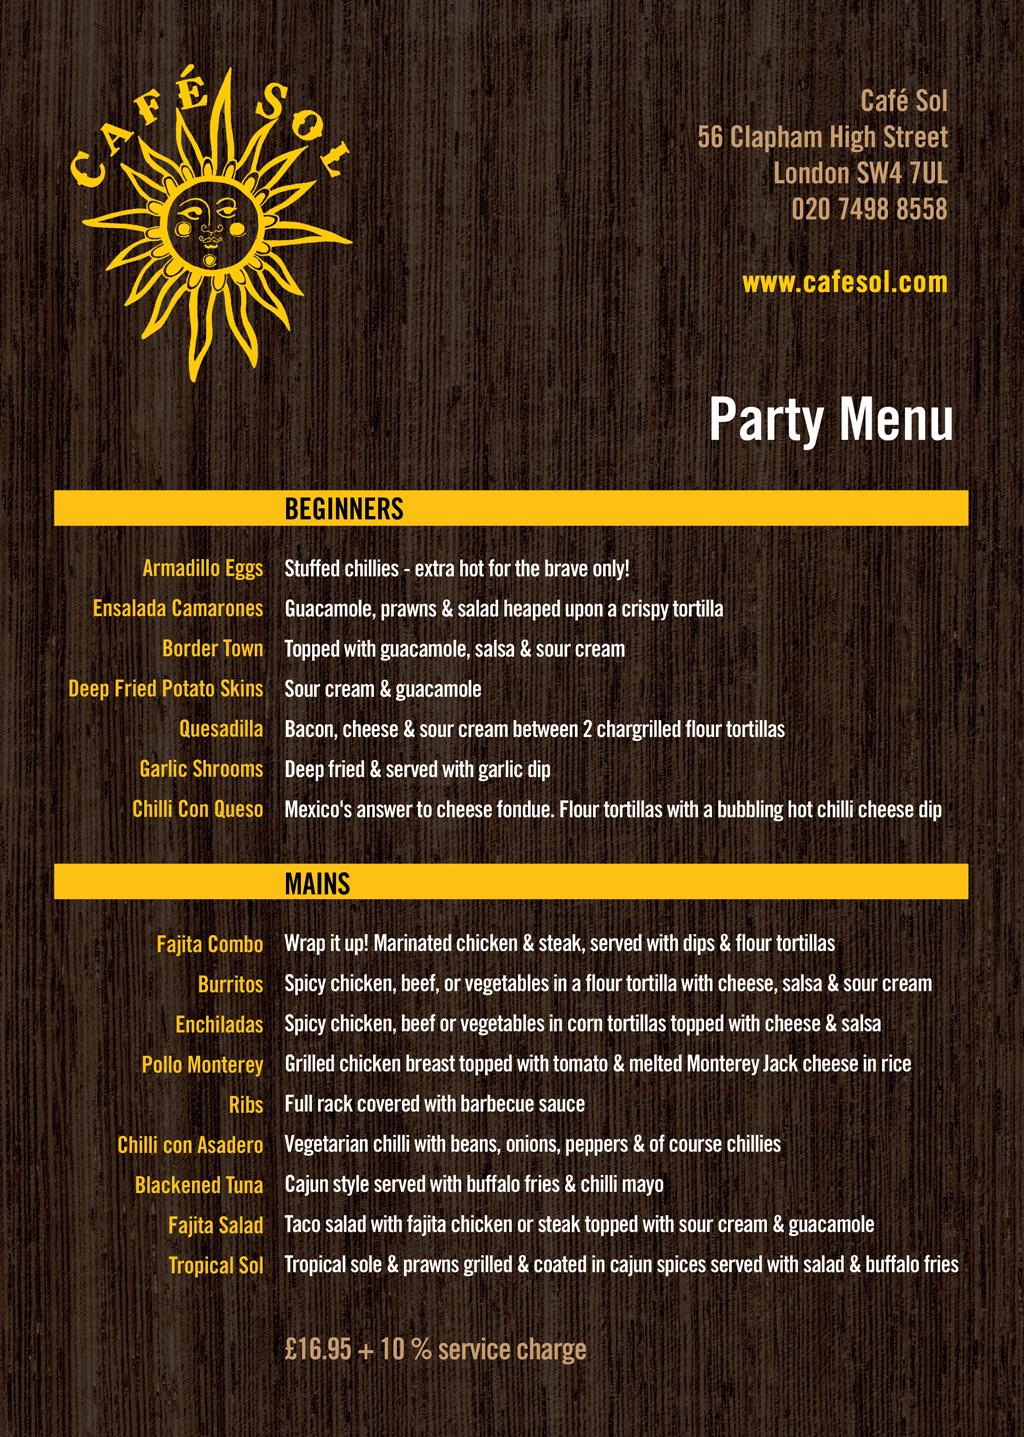 Cafe Sol - A4 Party Menu - Front - Thumbnail